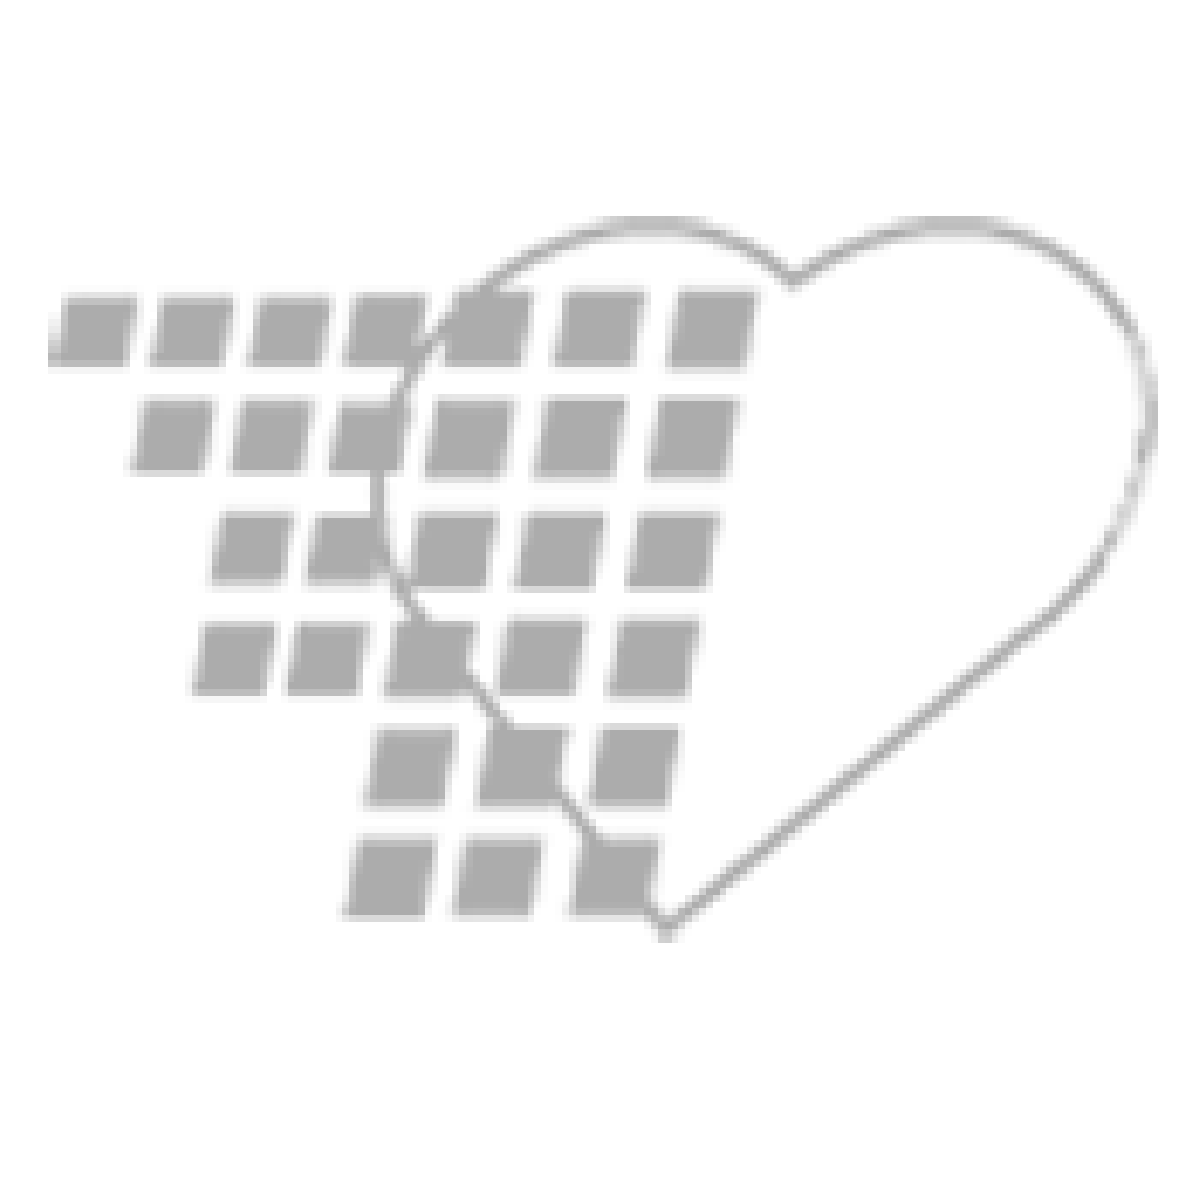 02-92-0210 Seca Infant Measuring Mat